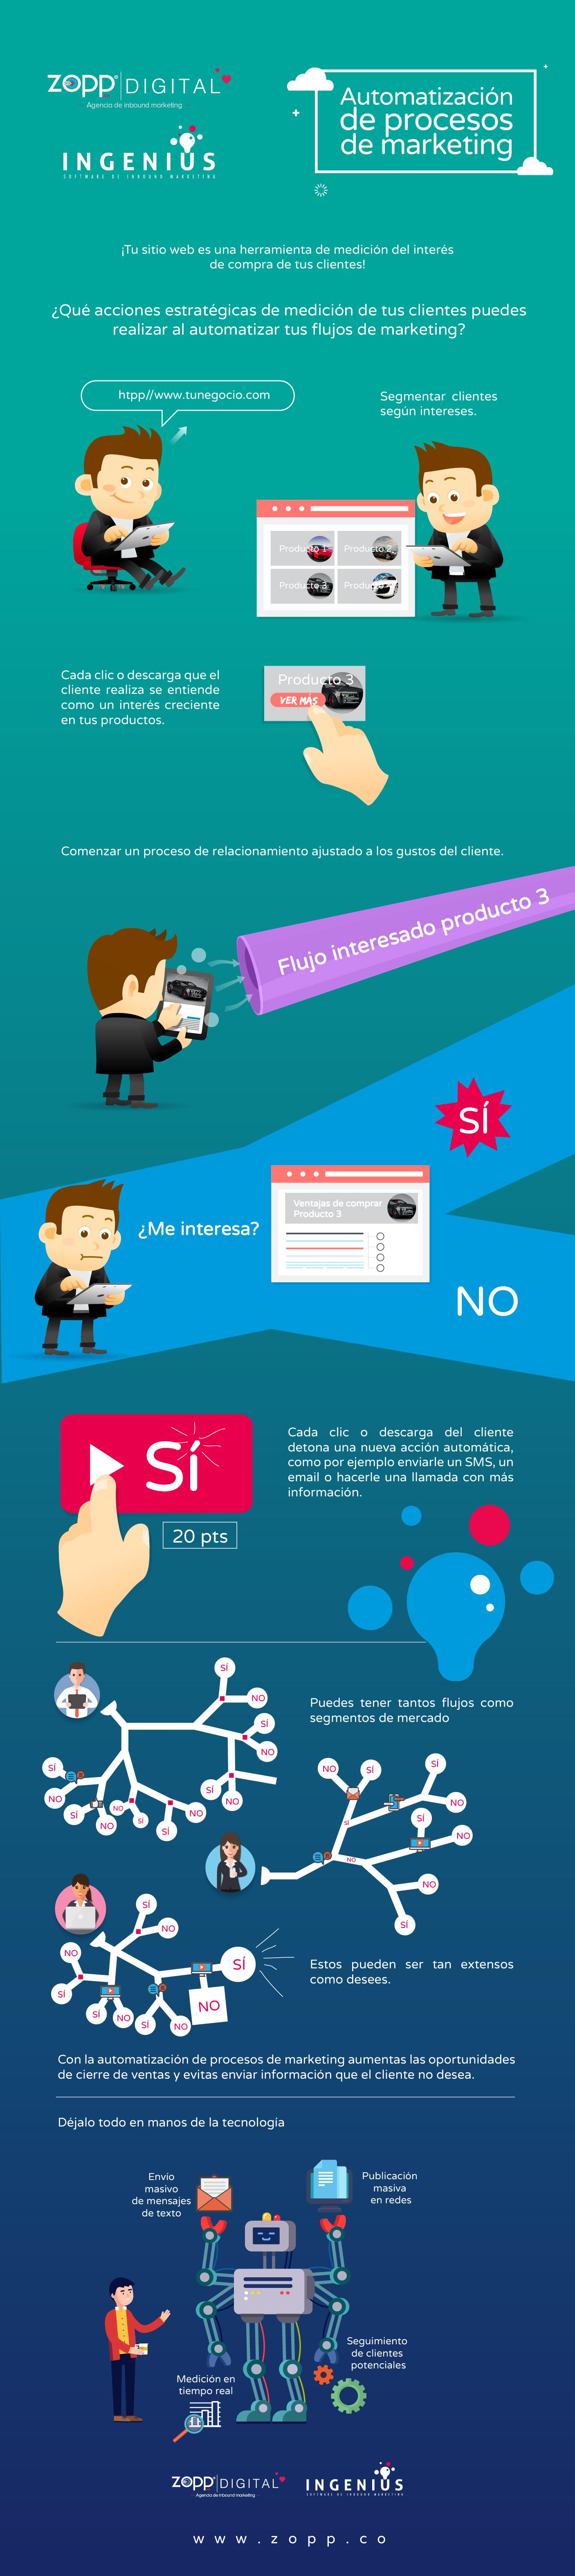 automatizacion de marketing infografico